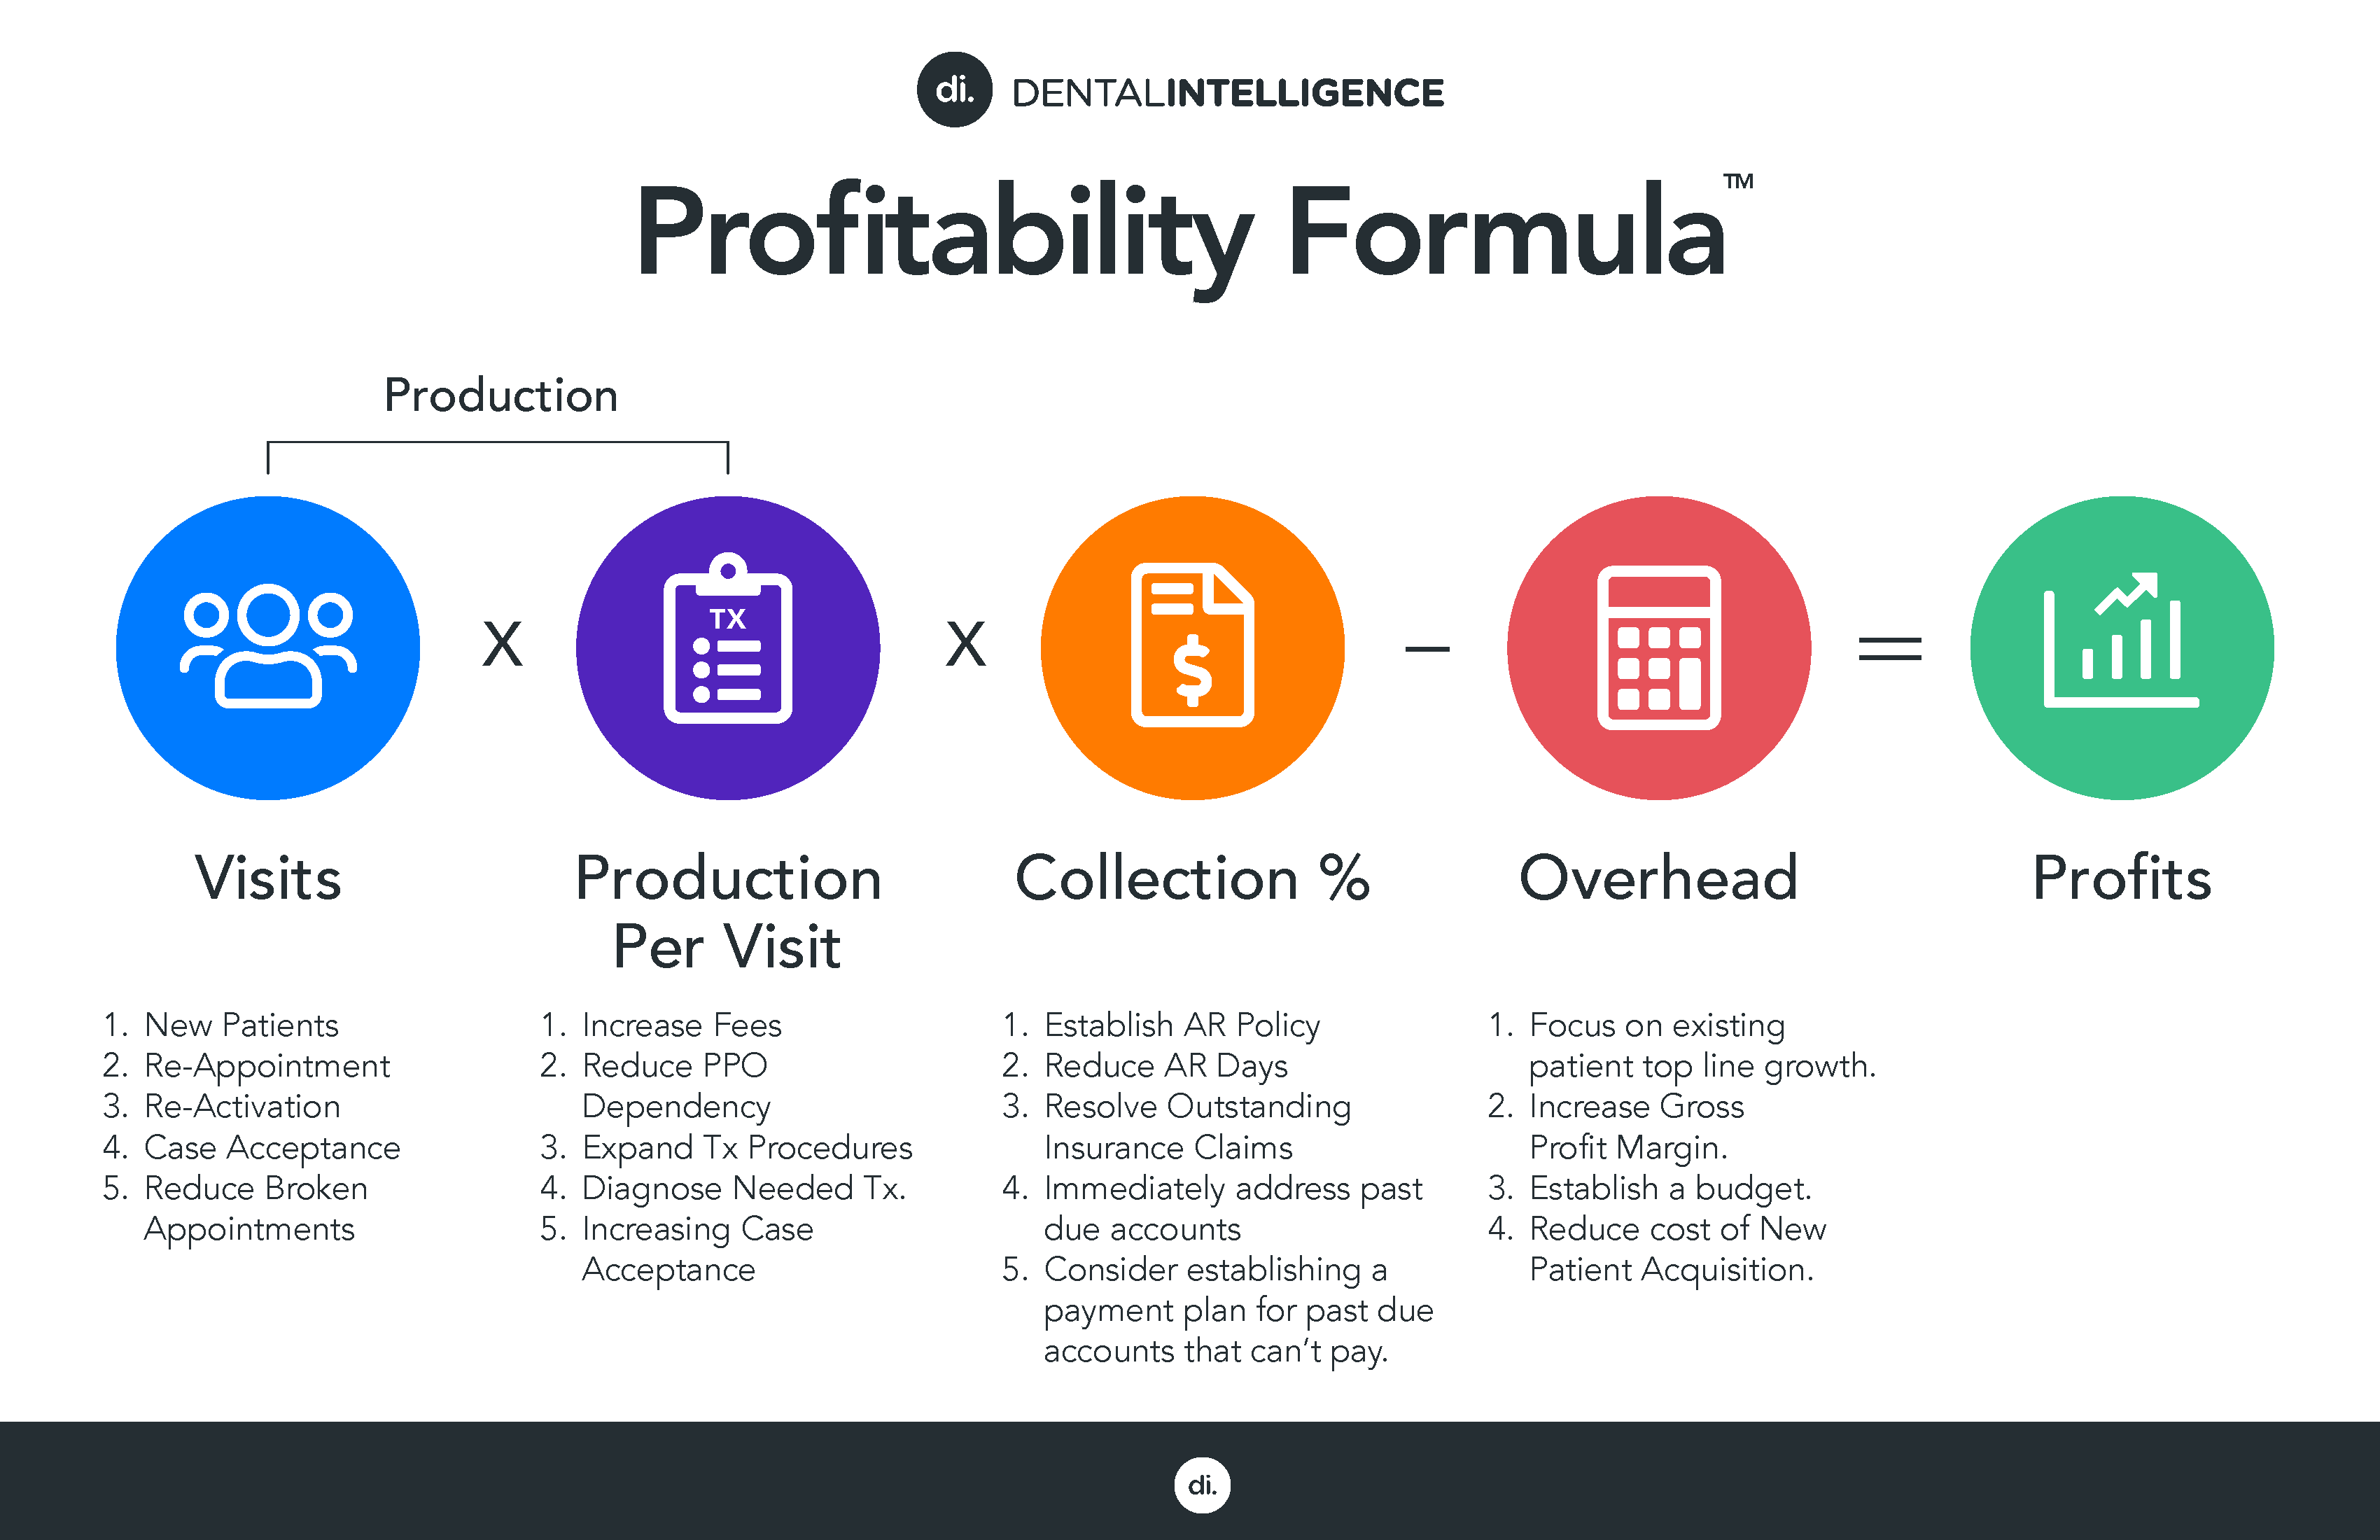 Profitability Formular